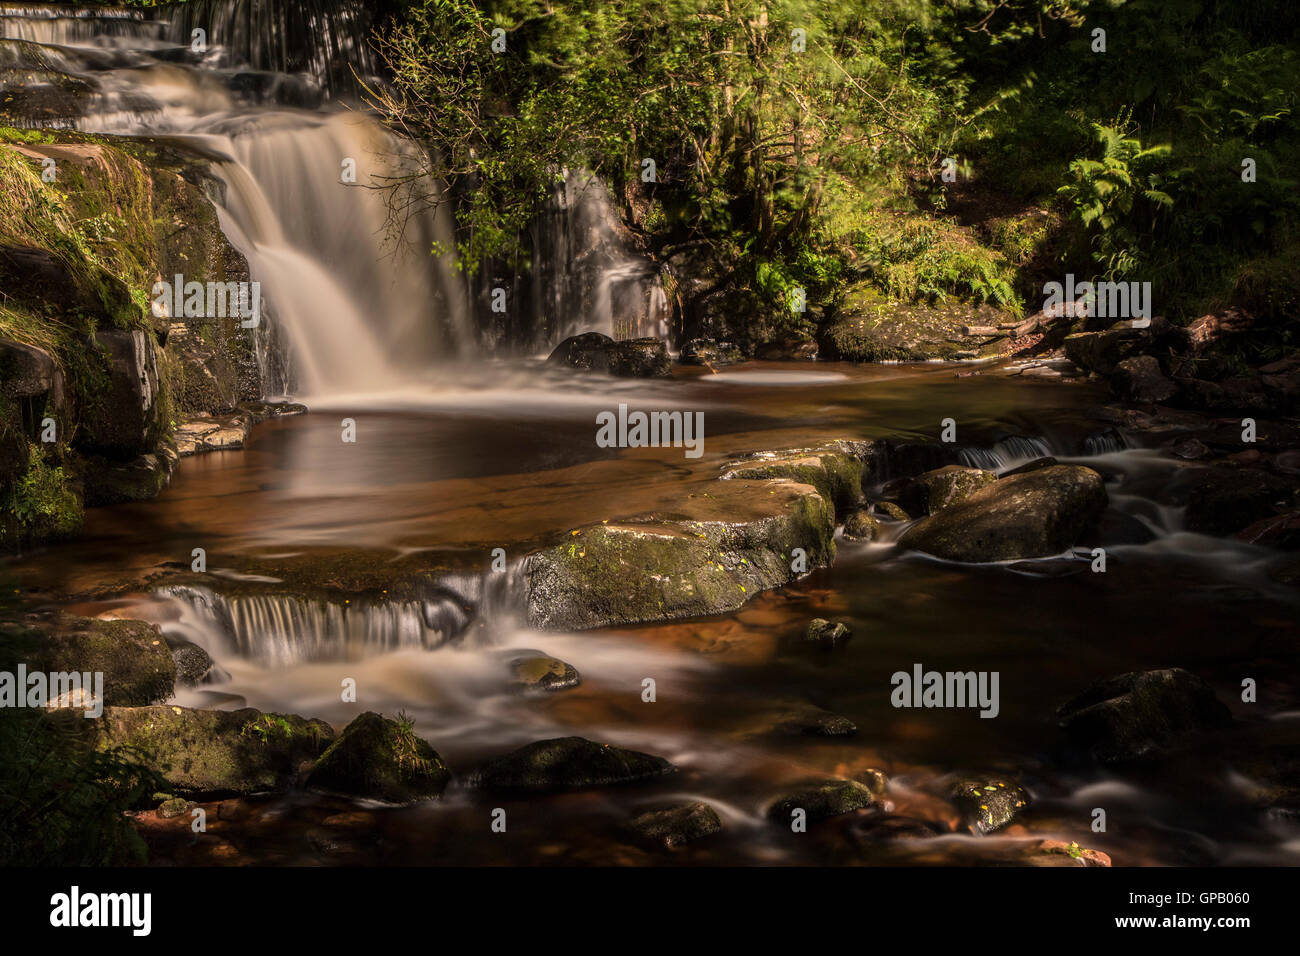 Blaen-Y-Glyn Waterfall Stock Photo